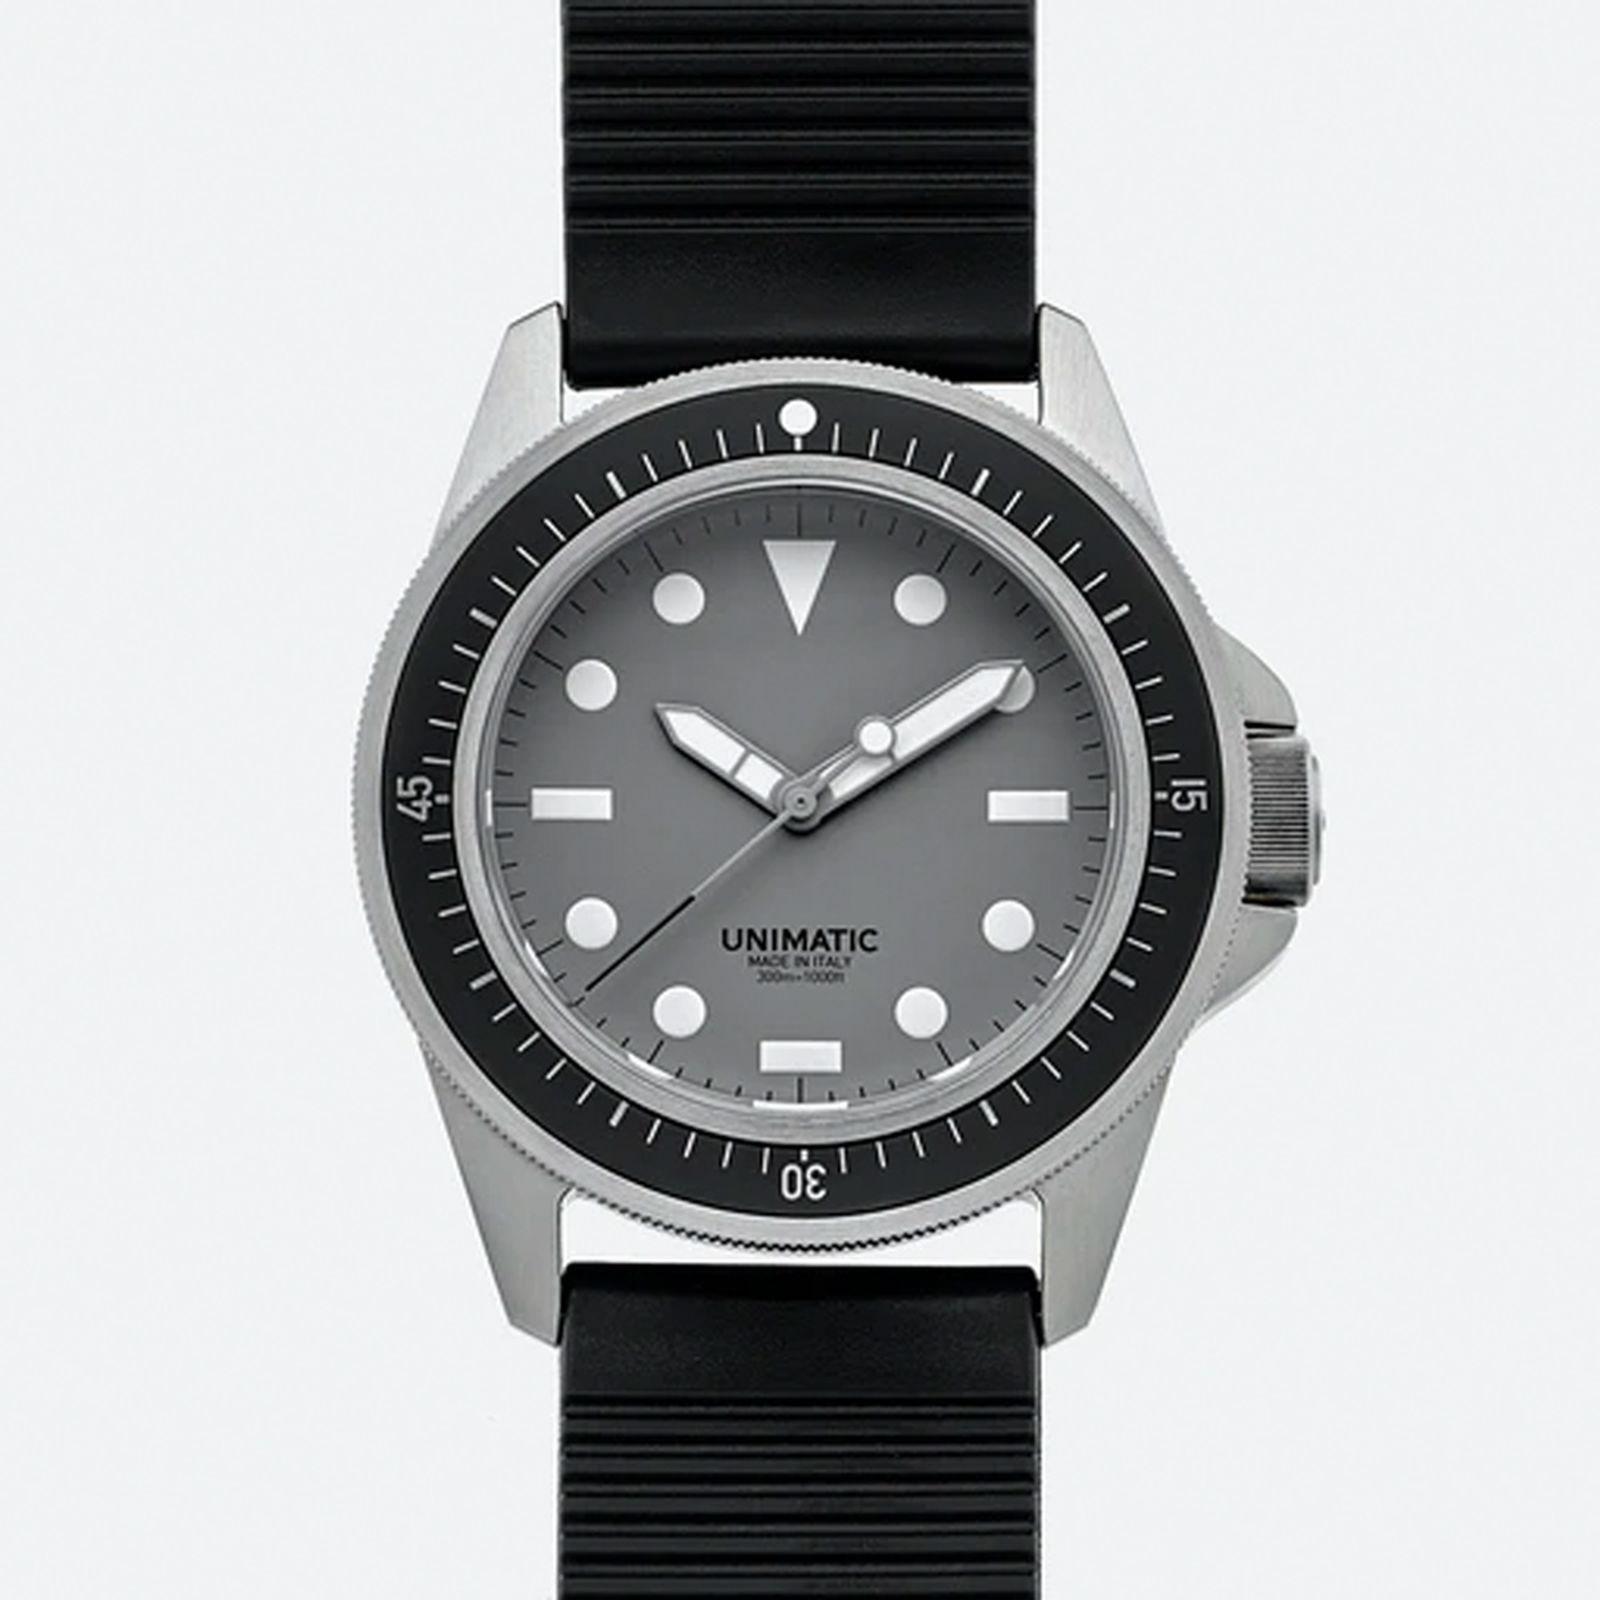 hodinkee-unimatic-price-release-date-02